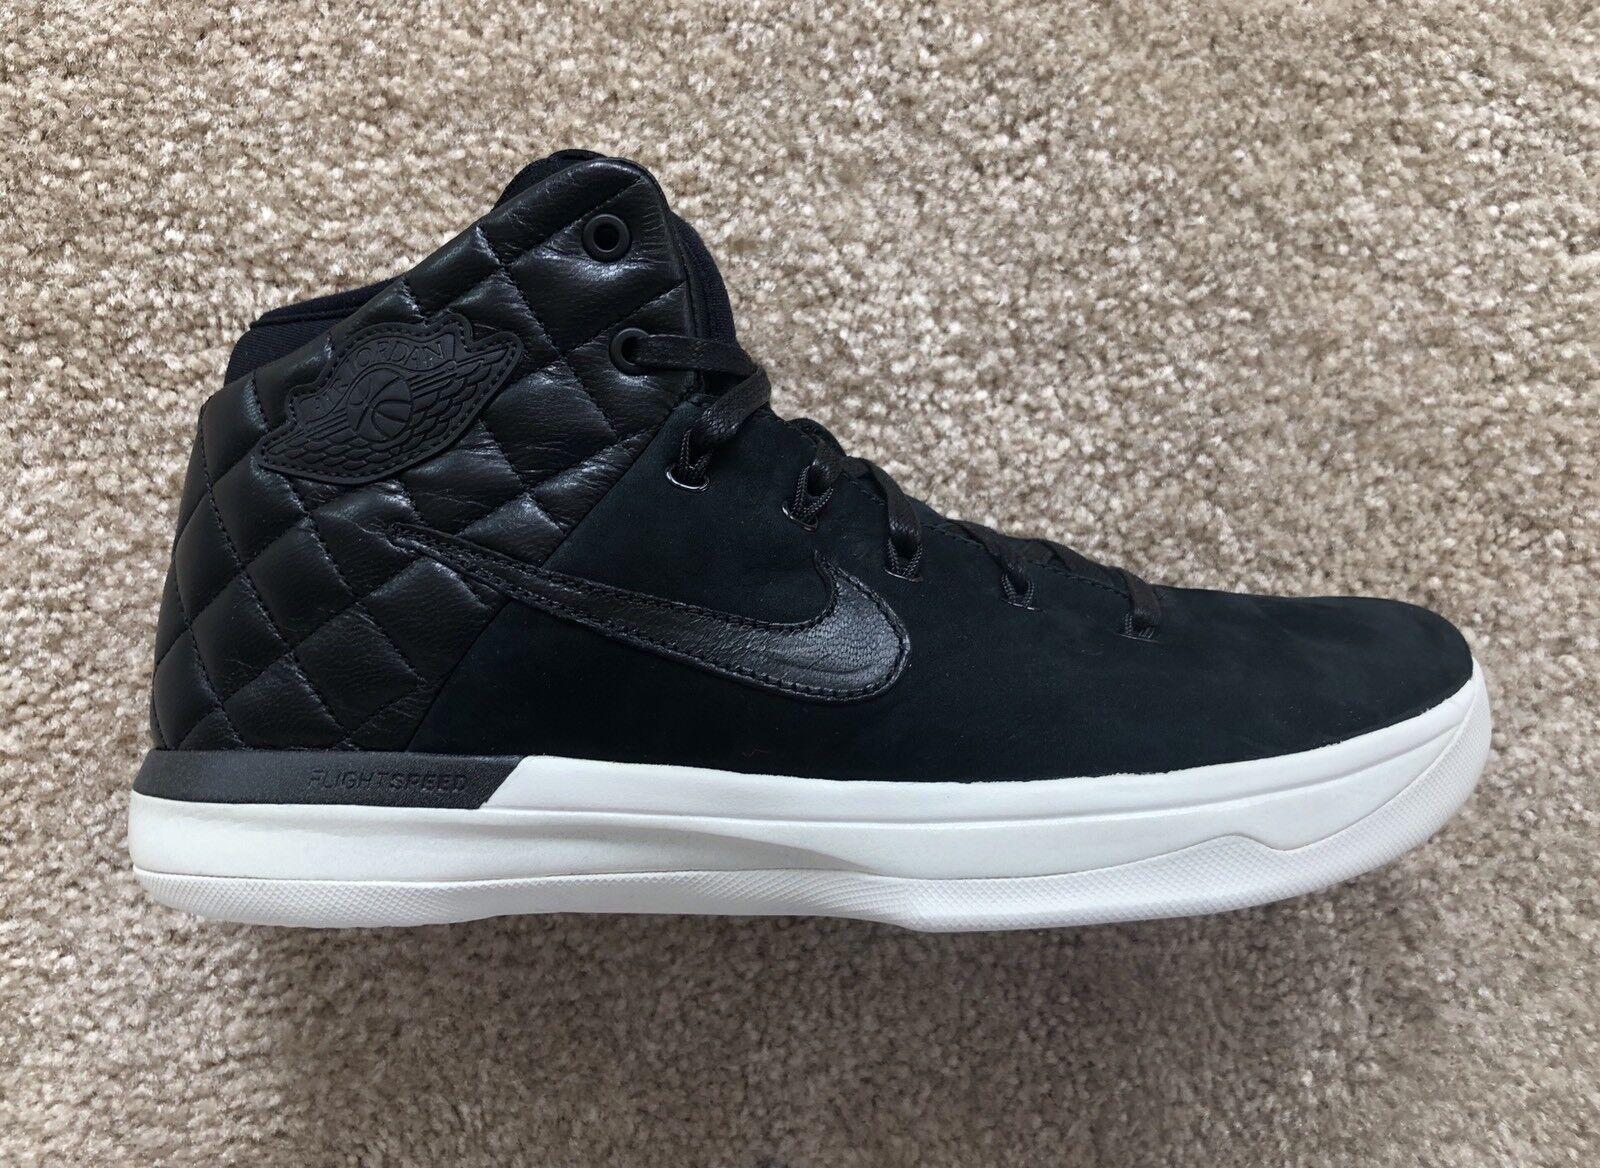 Nike Air Jordan XXXI 31 EP Cyber Monday Black Cat Shoes 854270-001 Size 11